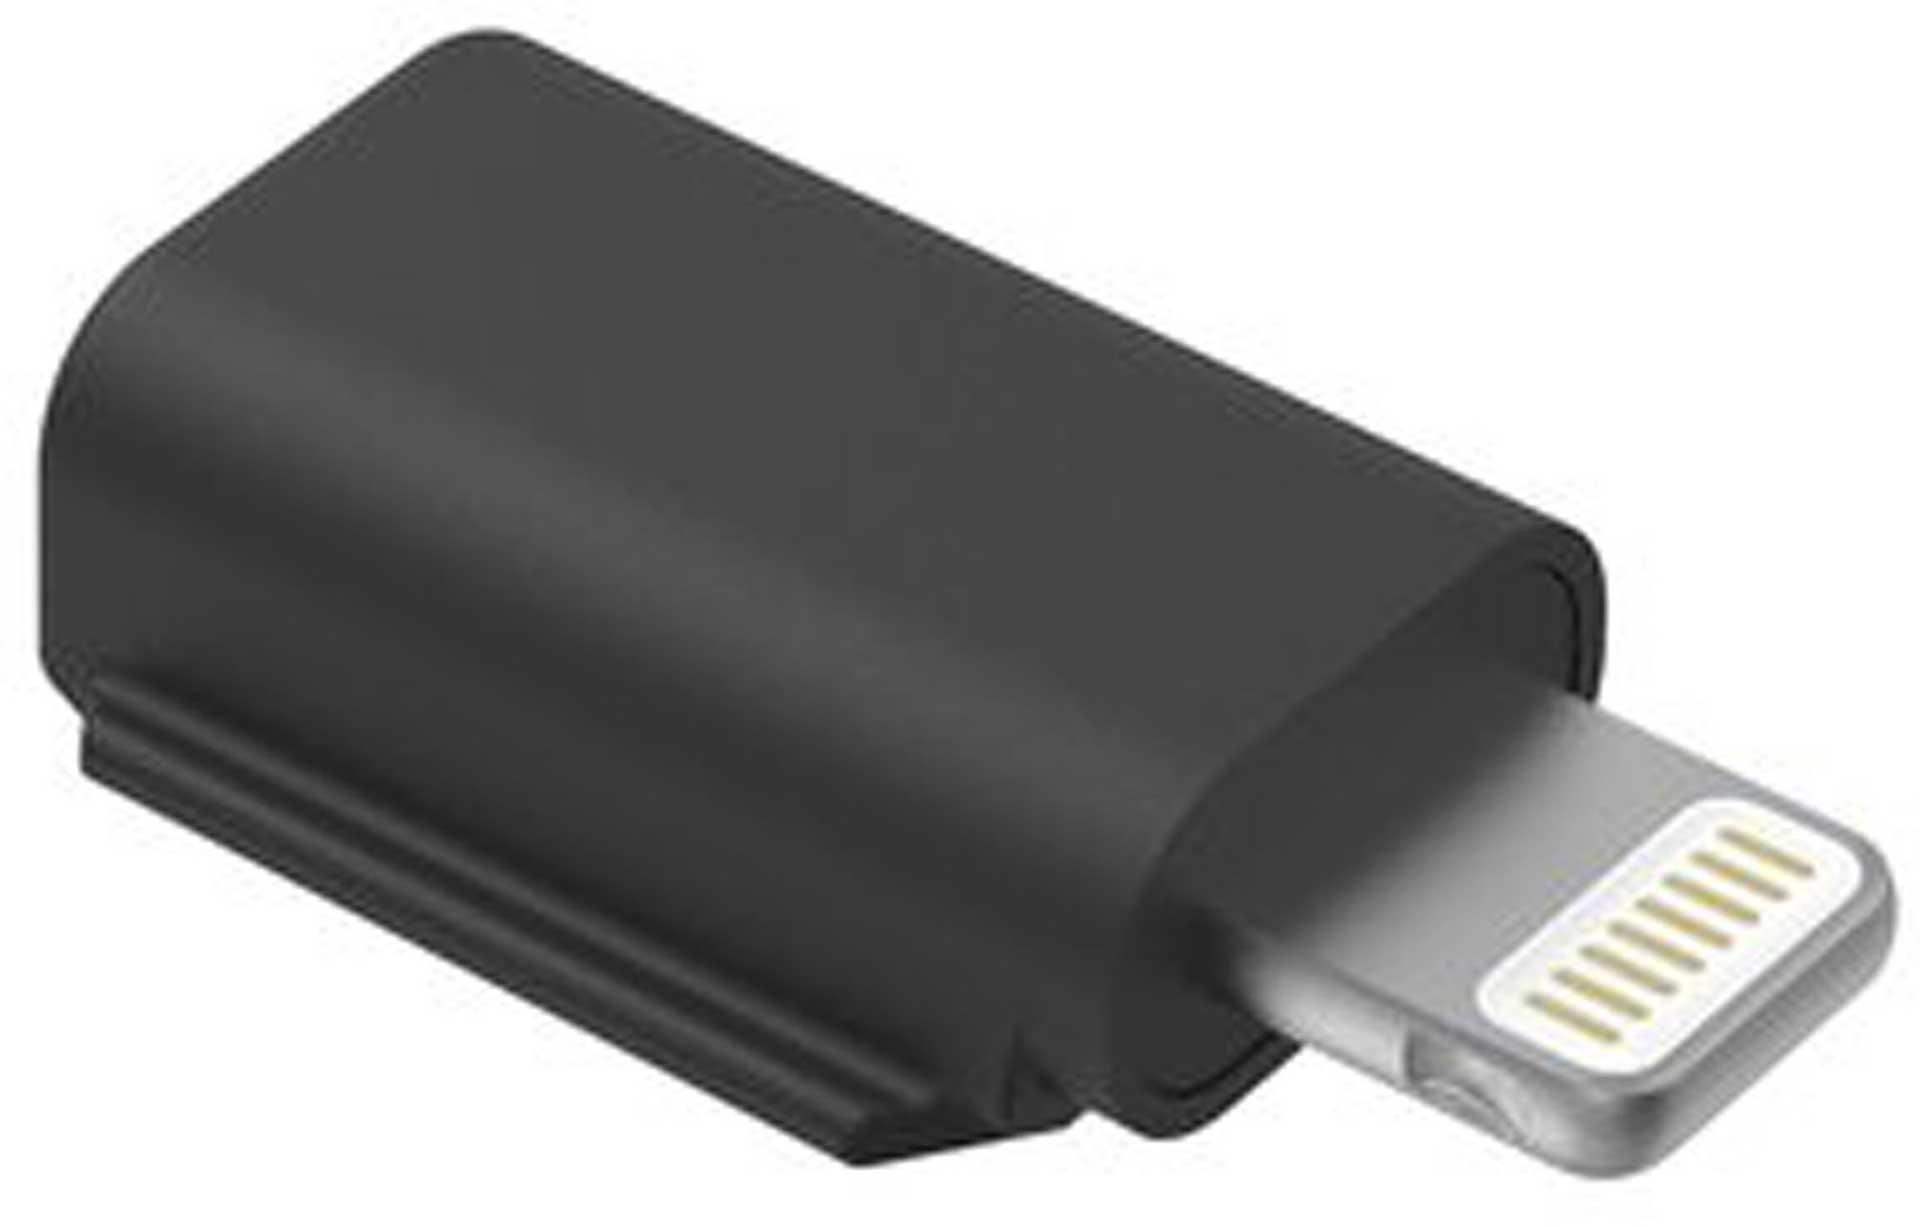 DJI OSMO POCKET LIGHTNING SMARTPHONE ADAPTER